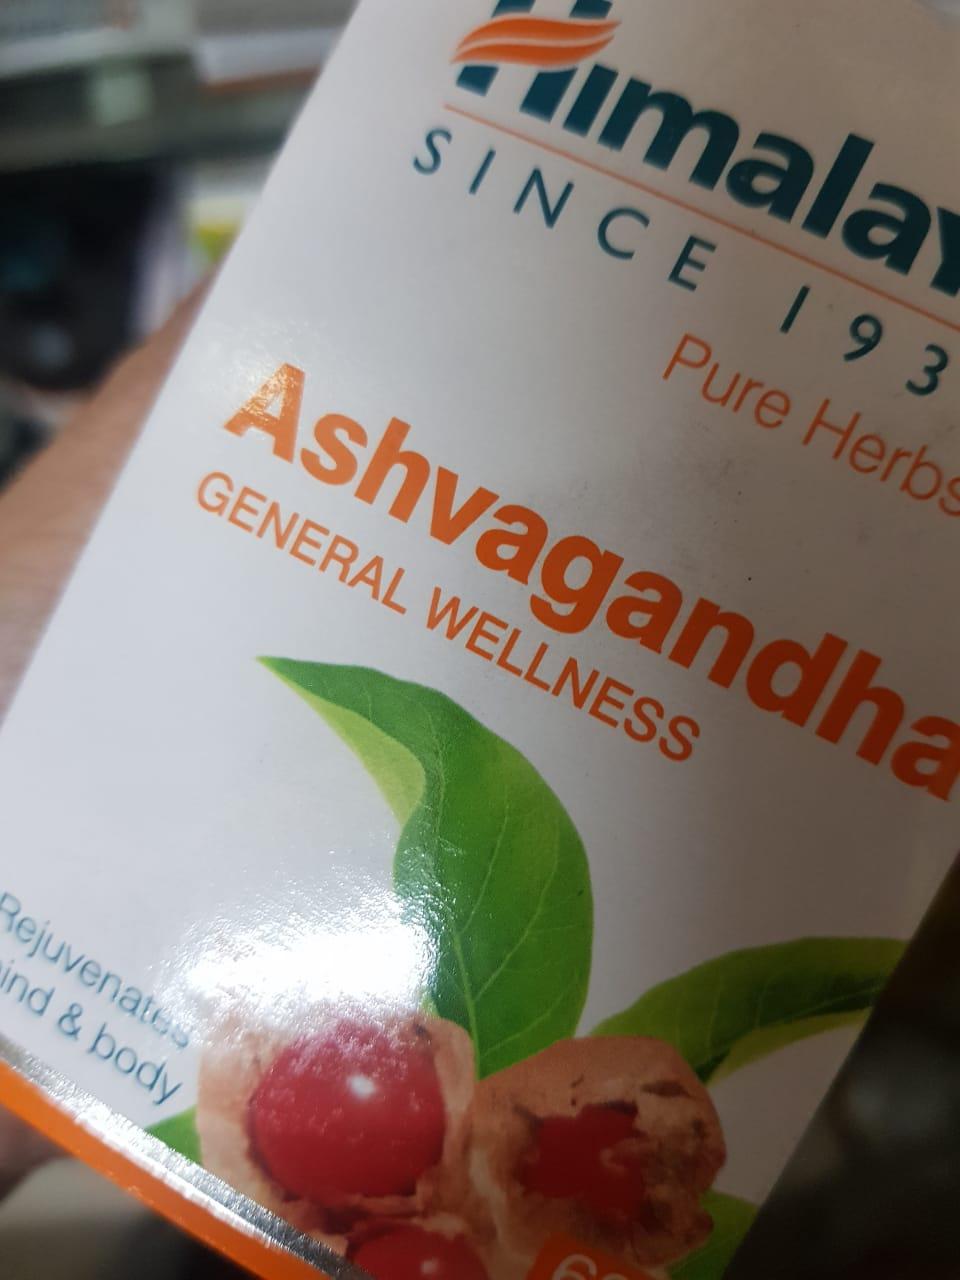 Himalaya Wellness Pure Herbs Ashvagandha Tablets -For wellness-By poonam_kakkar